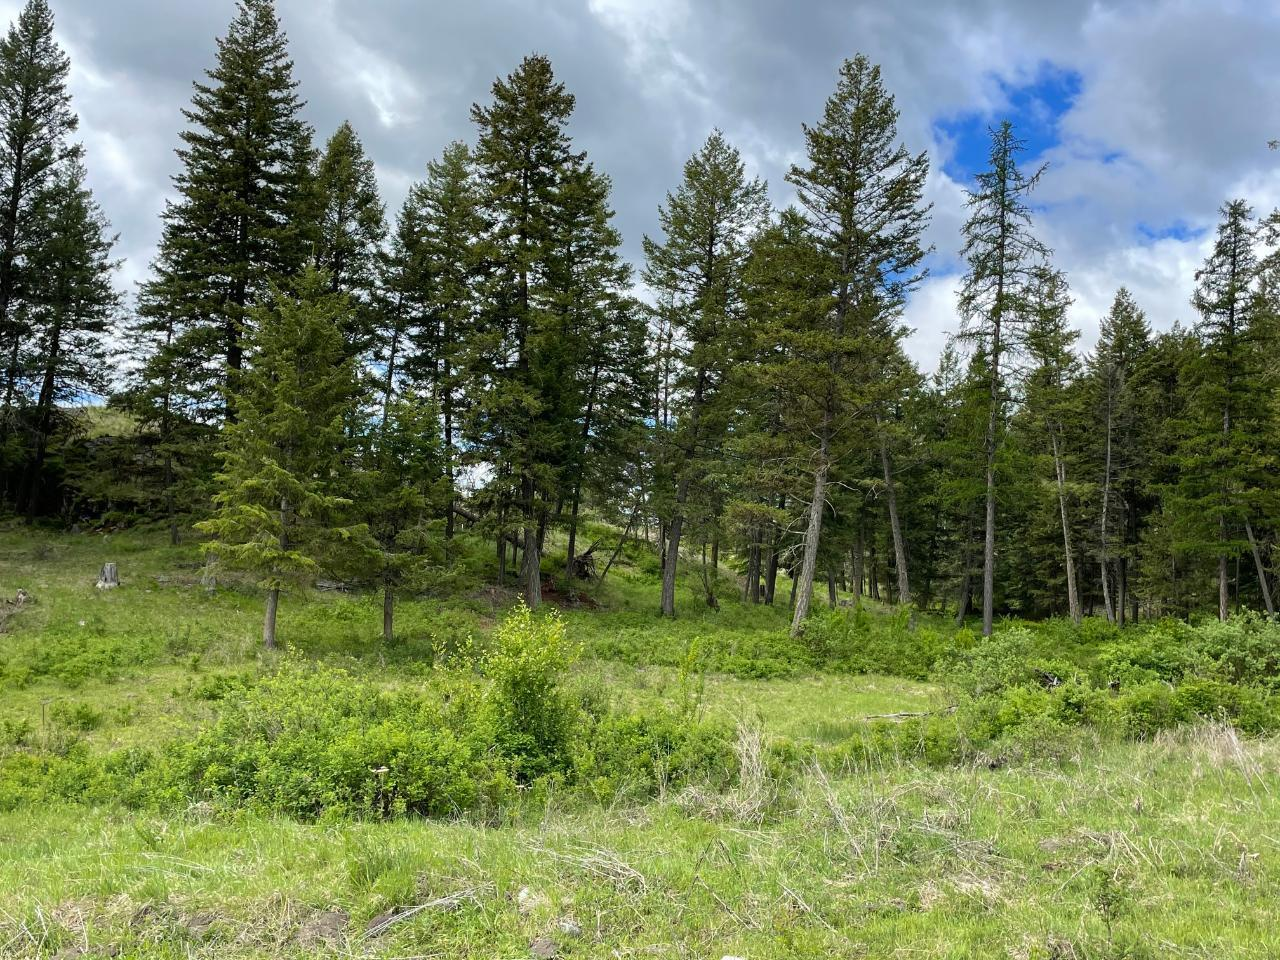 4685 Hwy 3,, Rock Creek/bridesville, British Columbia  V0H 1Y0 - Photo 54 - 189733